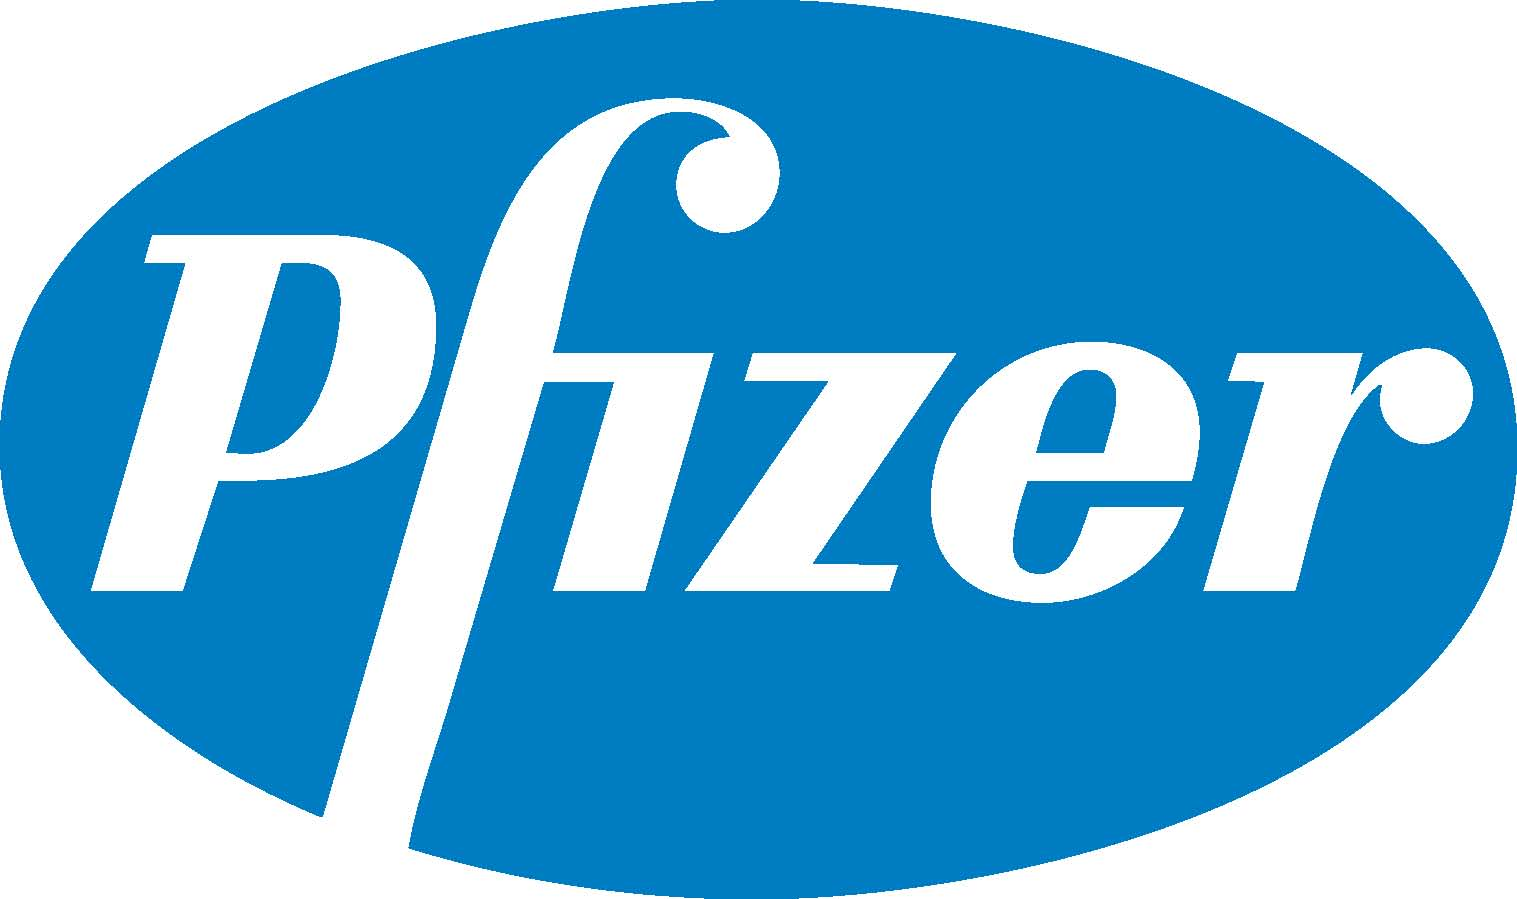 Pfizer Logo Wallpaper